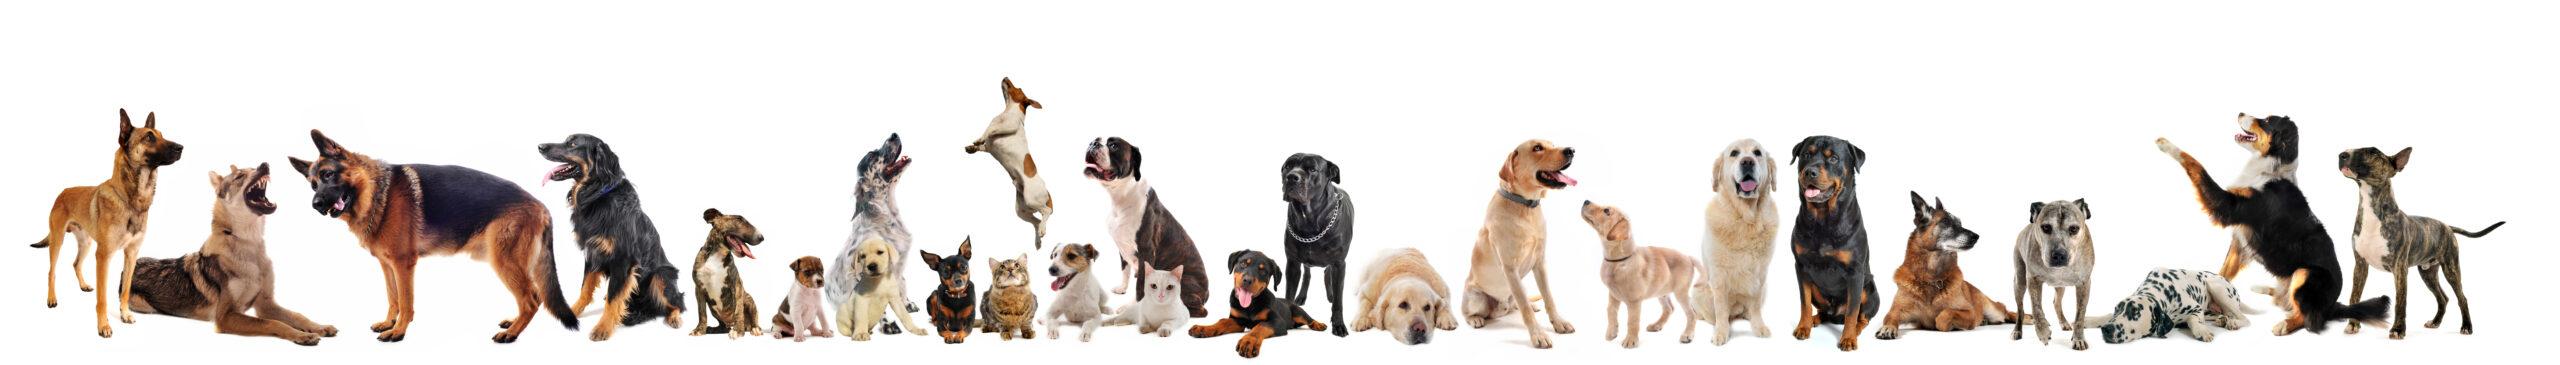 Online classes animal portraits |